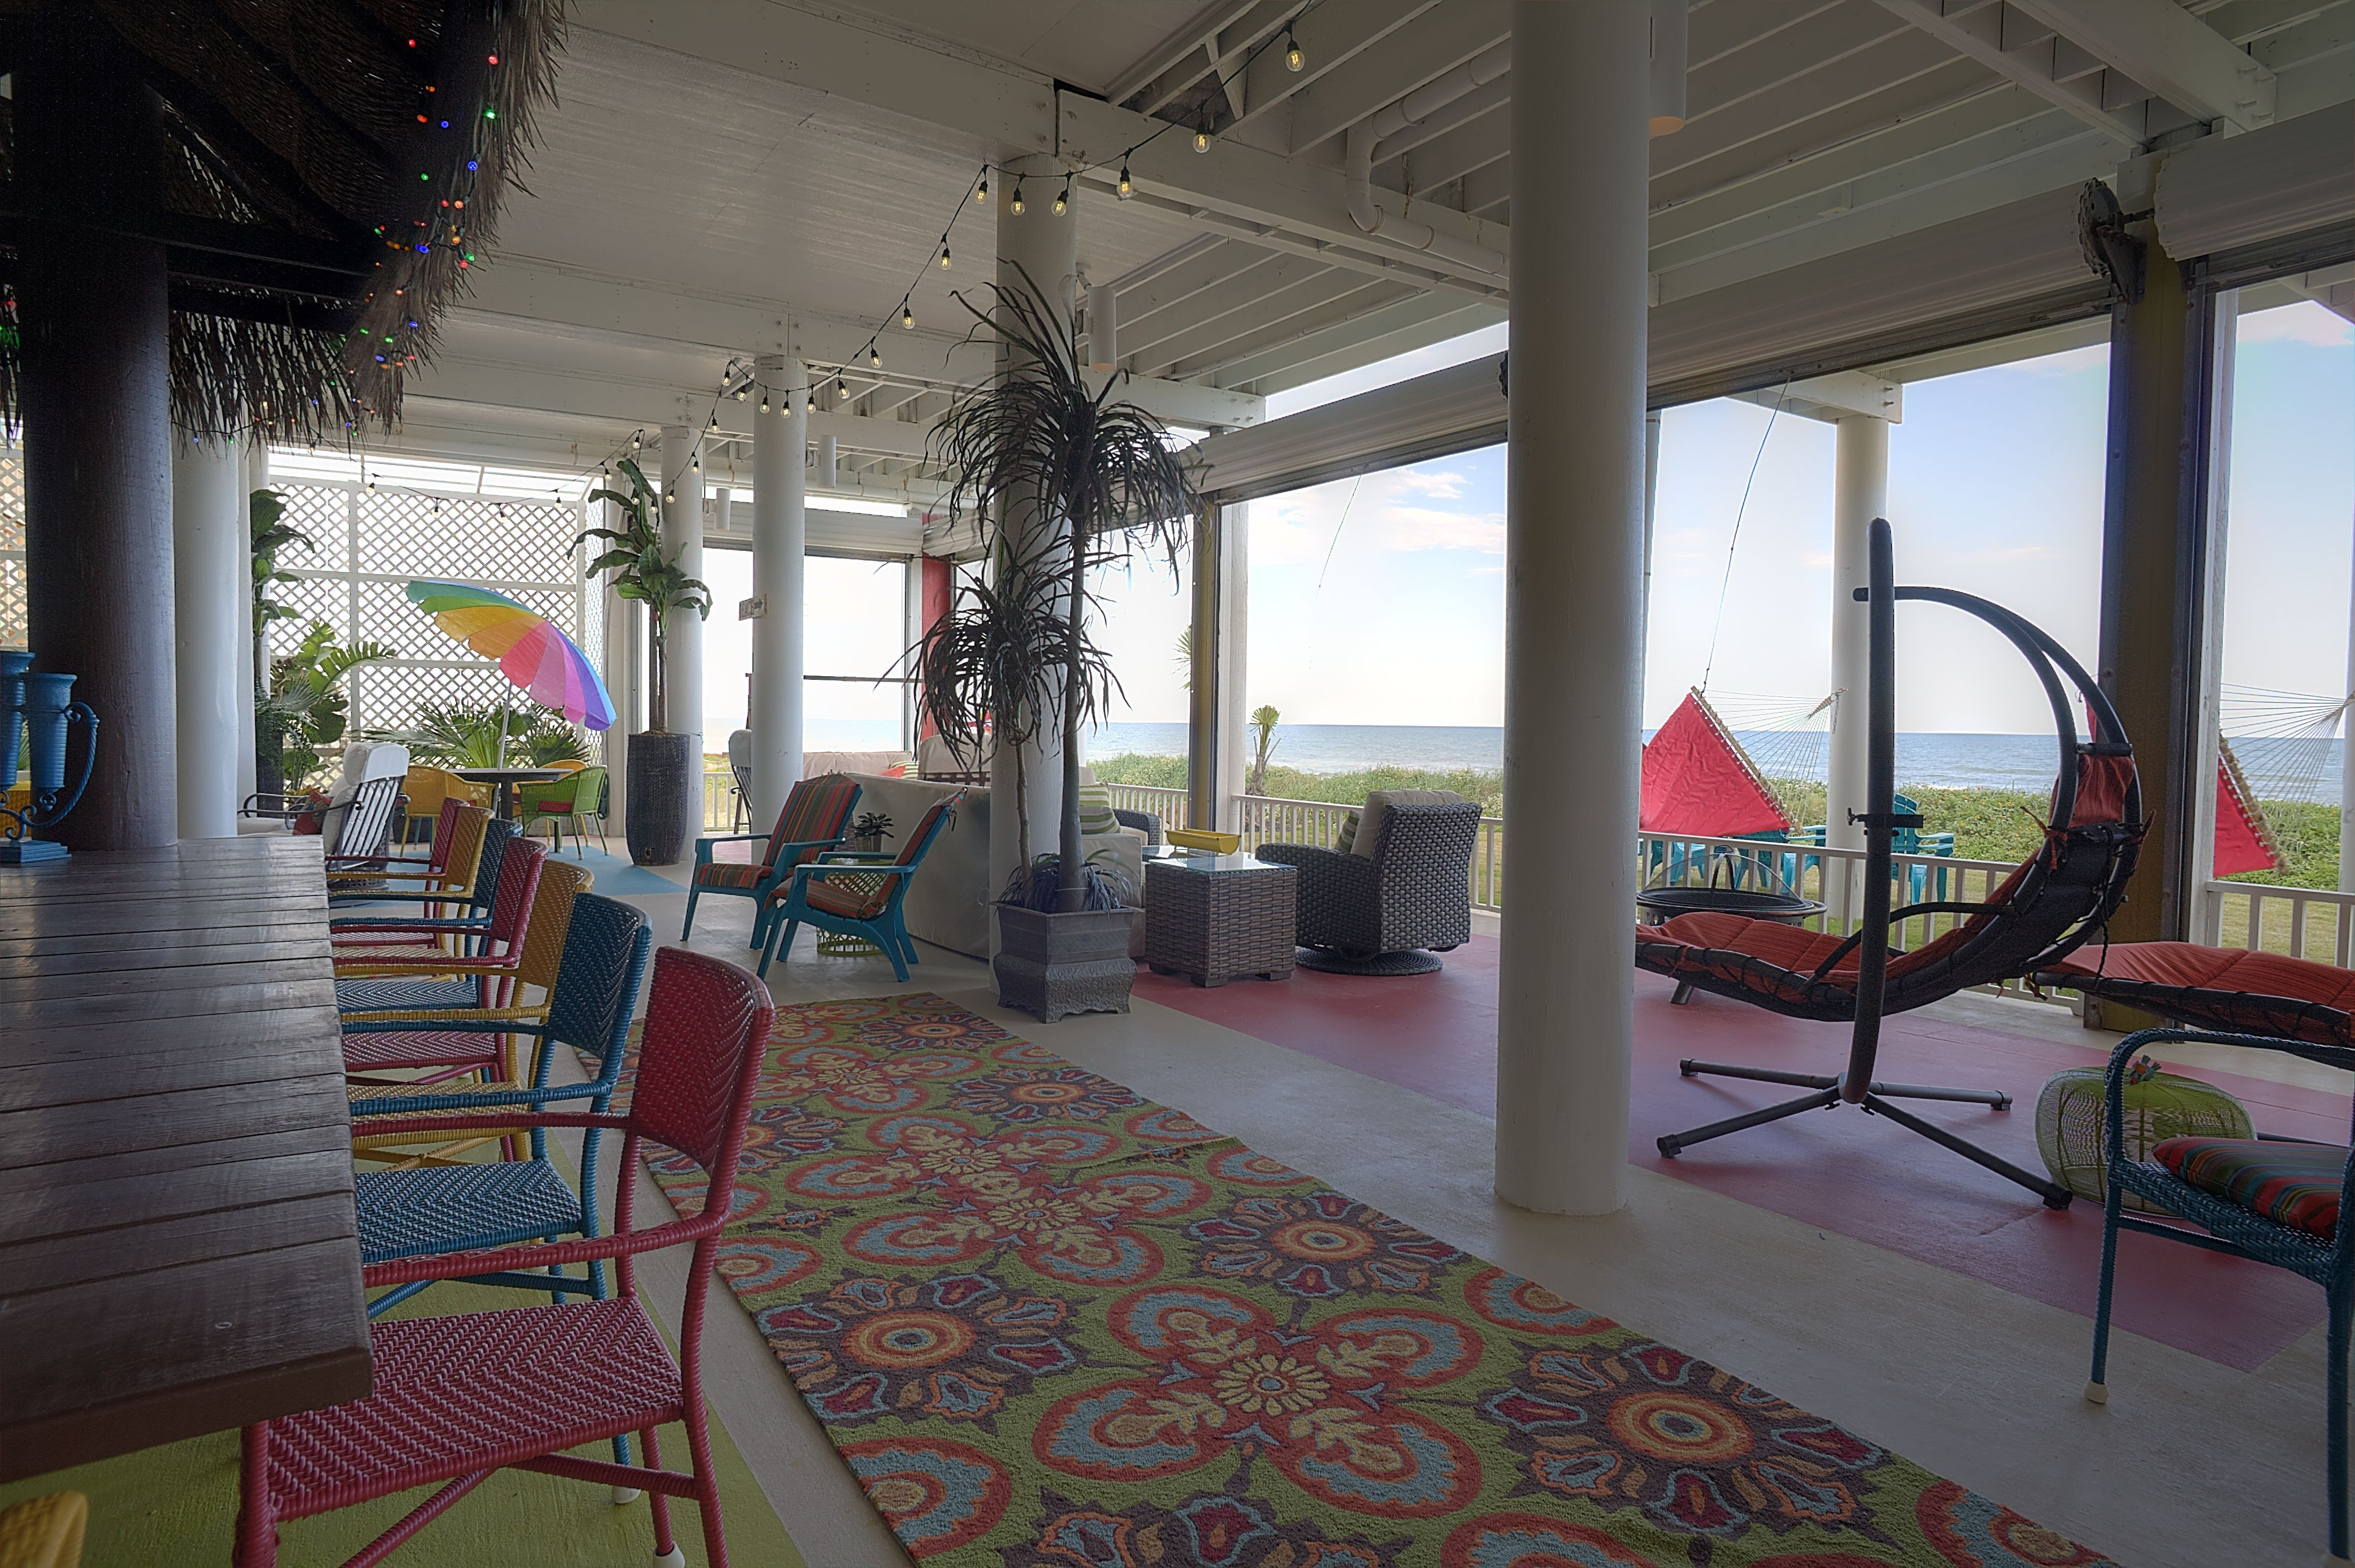 Galveston Wedding Venue on the beach. Beautiful outdoor ...